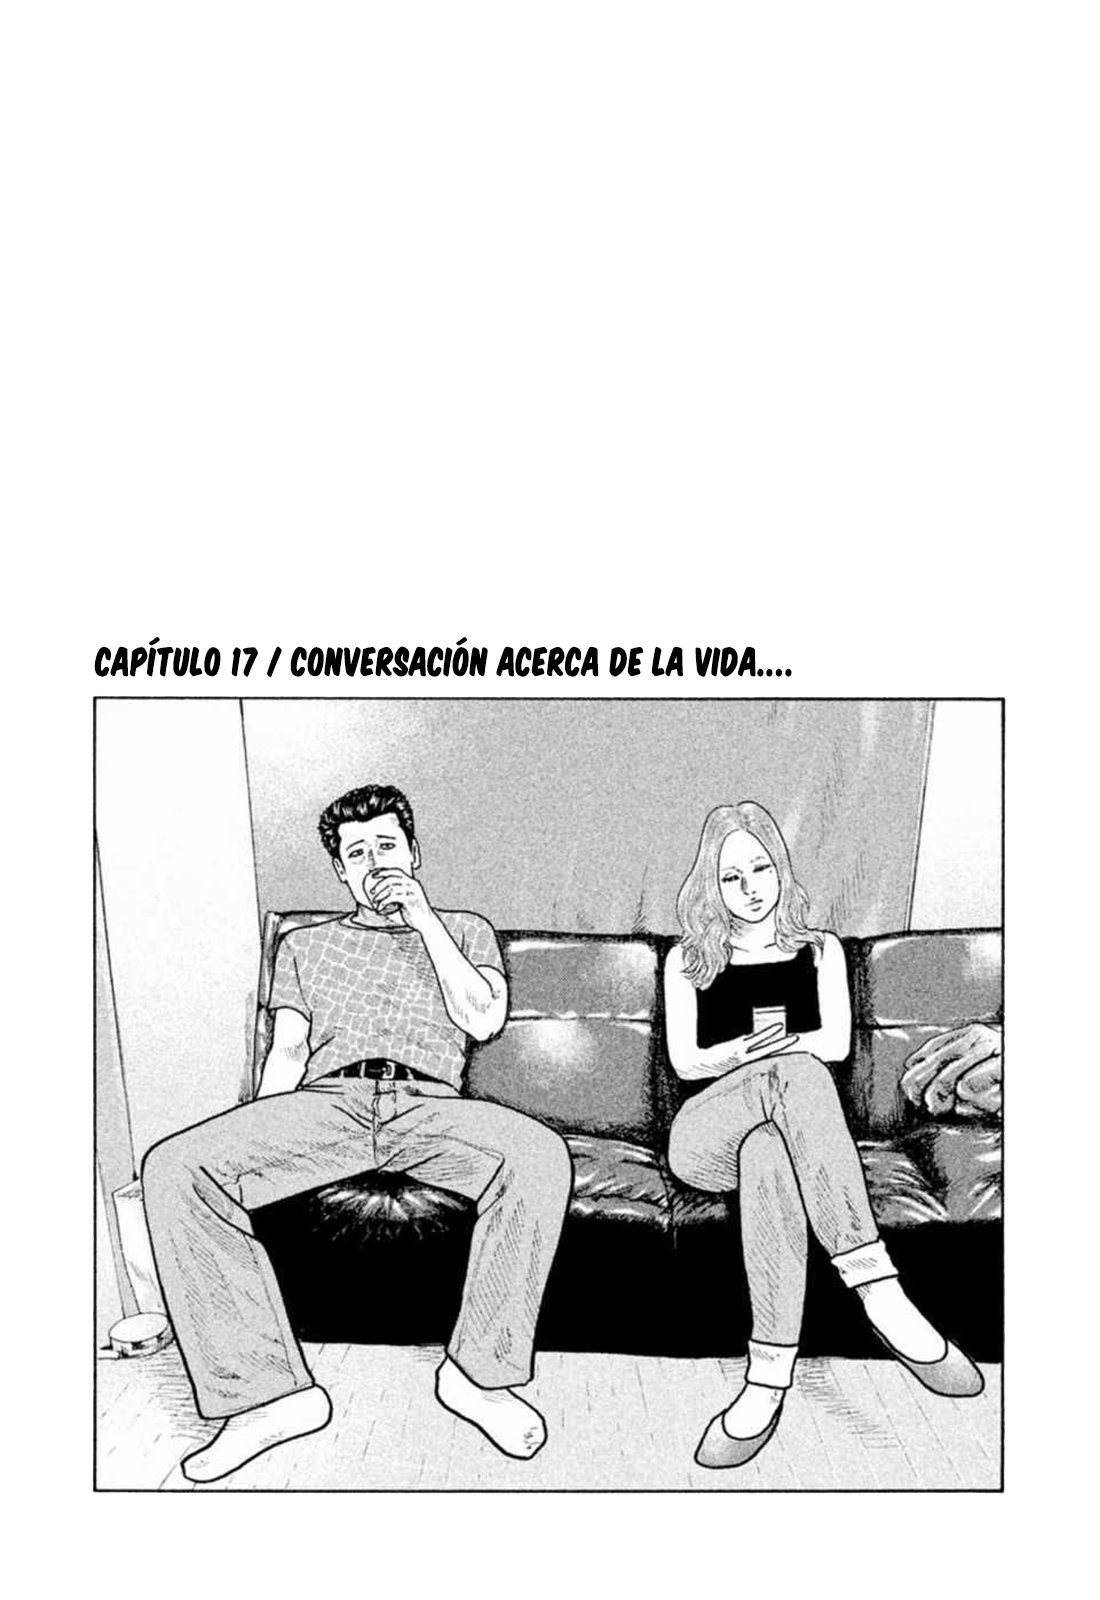 https://nine.mangadogs.com/es_manga/pic8/53/34037/952991/09586f3a443fd7ab6d9655064a0e5e37.jpg Page 1